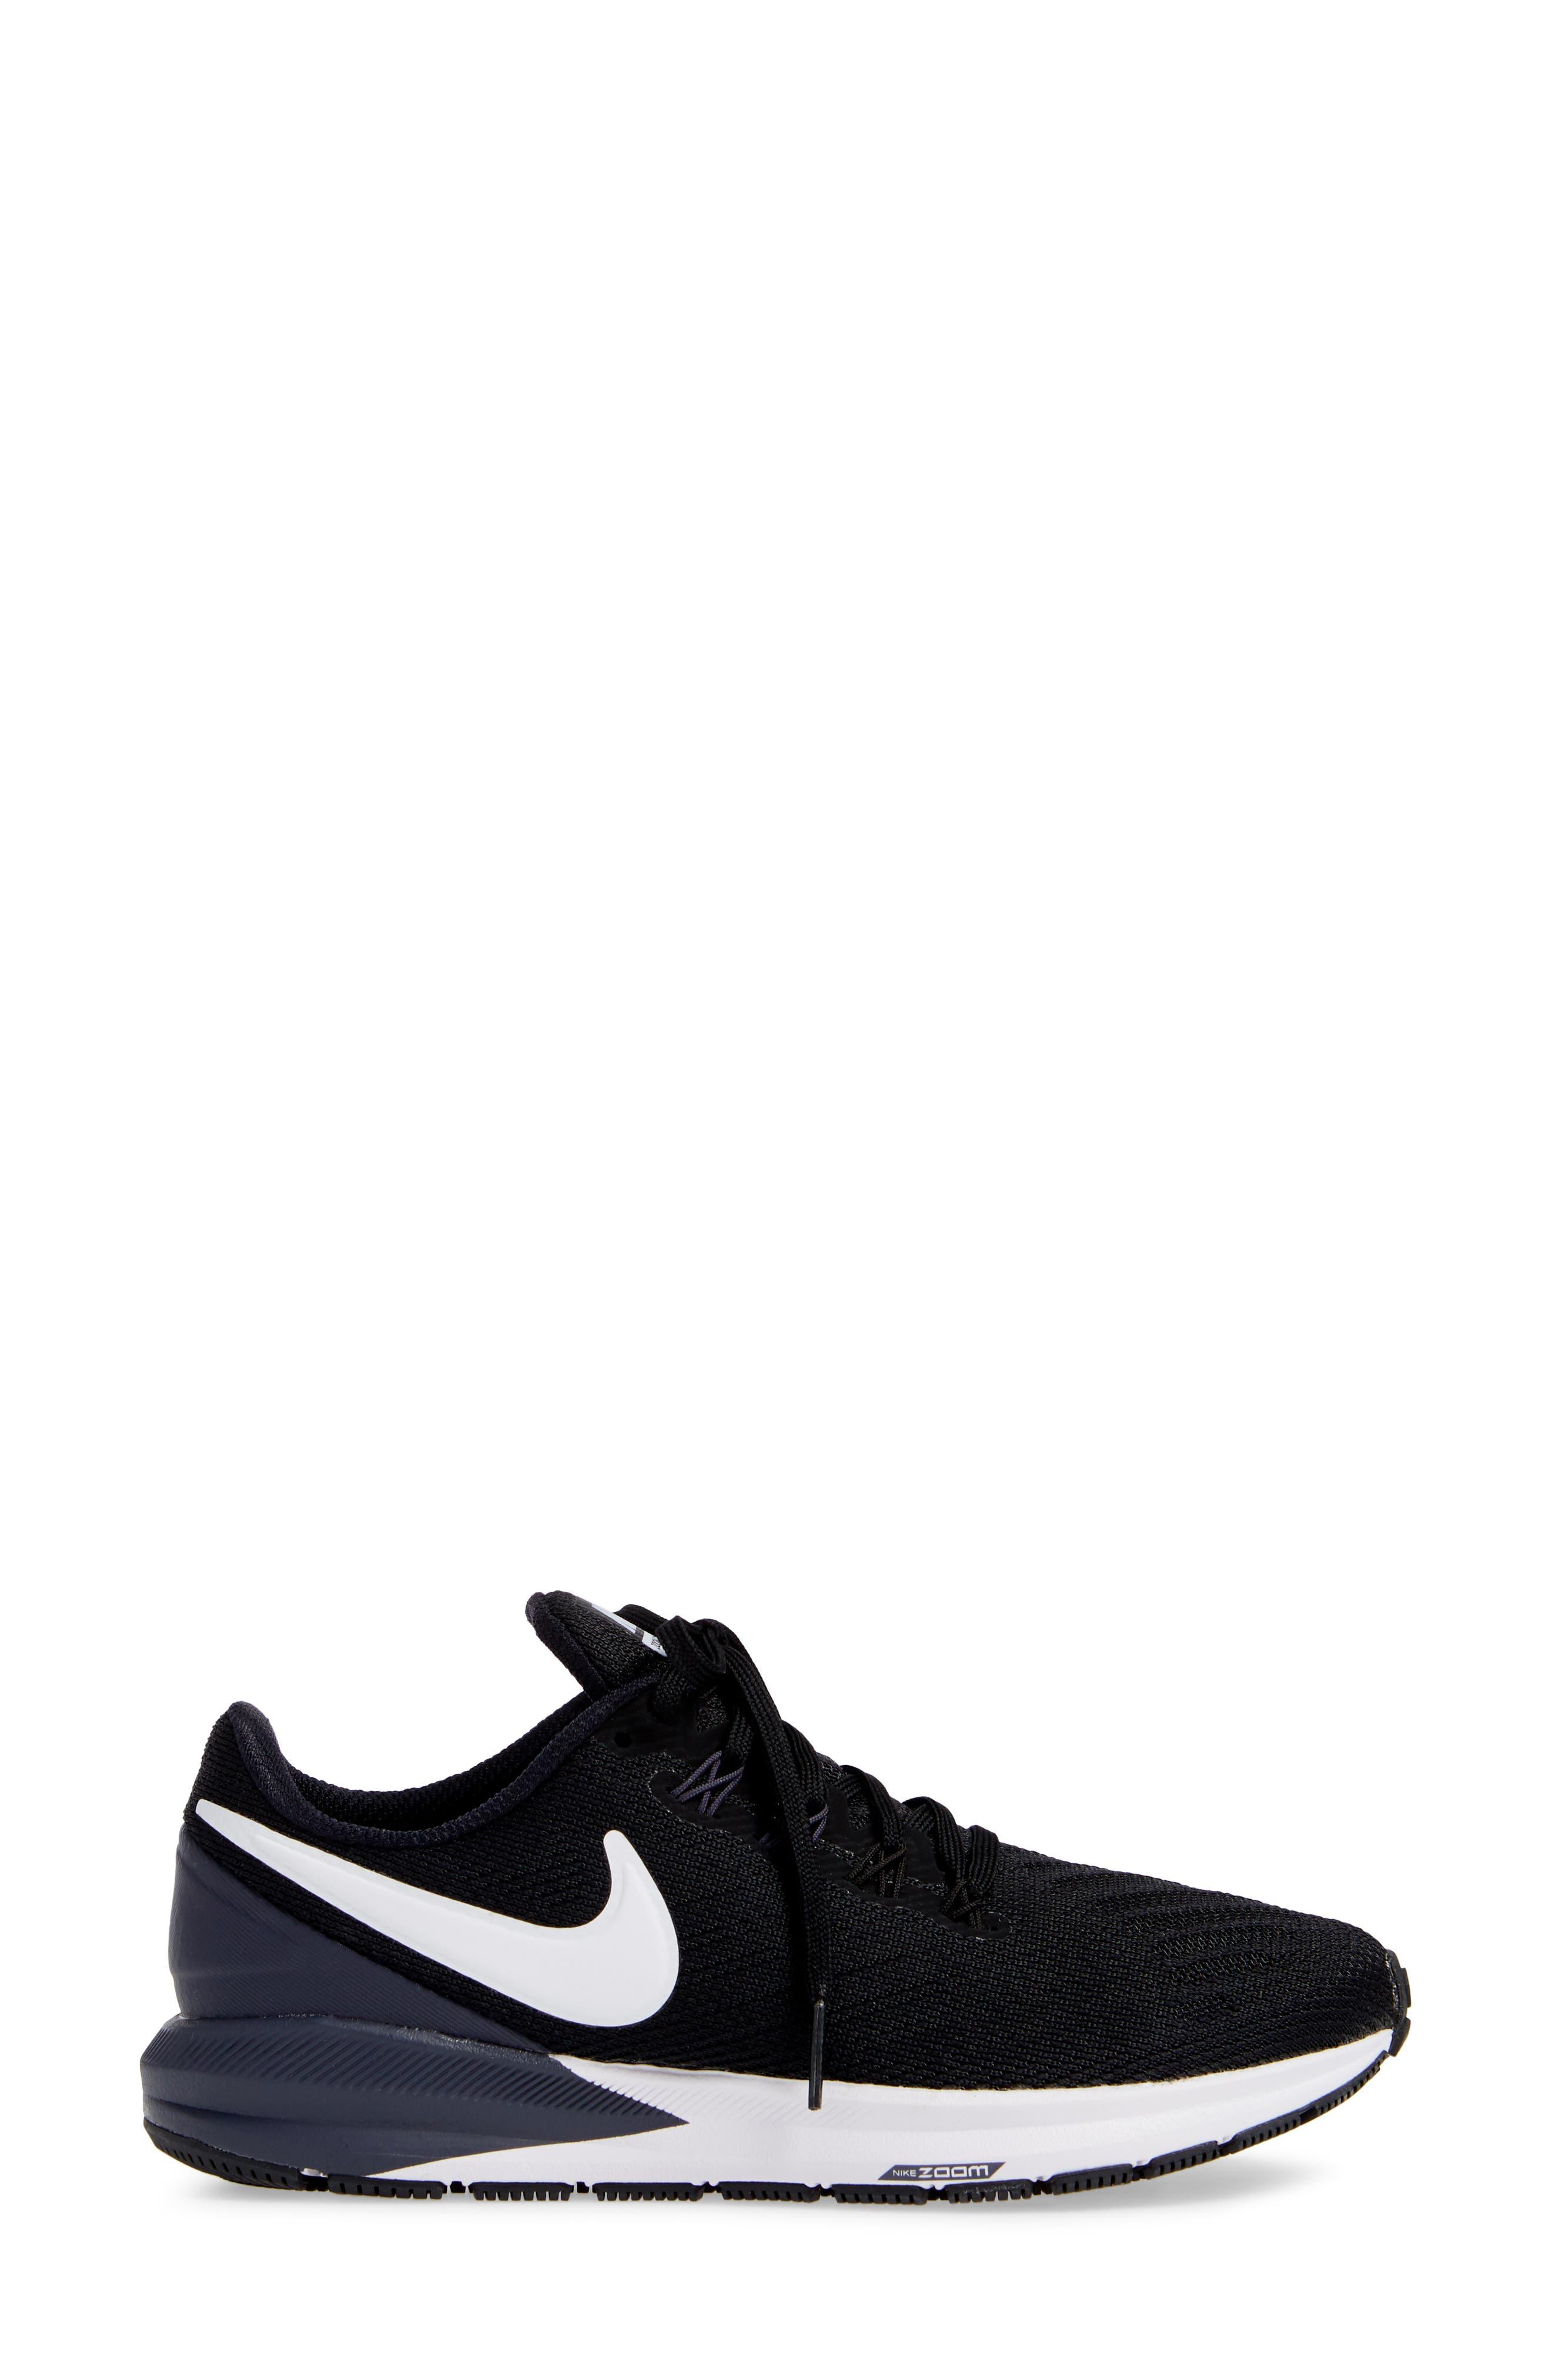 NIKE, Air Zoom Structure 22 Sneaker, Alternate thumbnail 3, color, BLACK/ WHITE-GRIDIRON